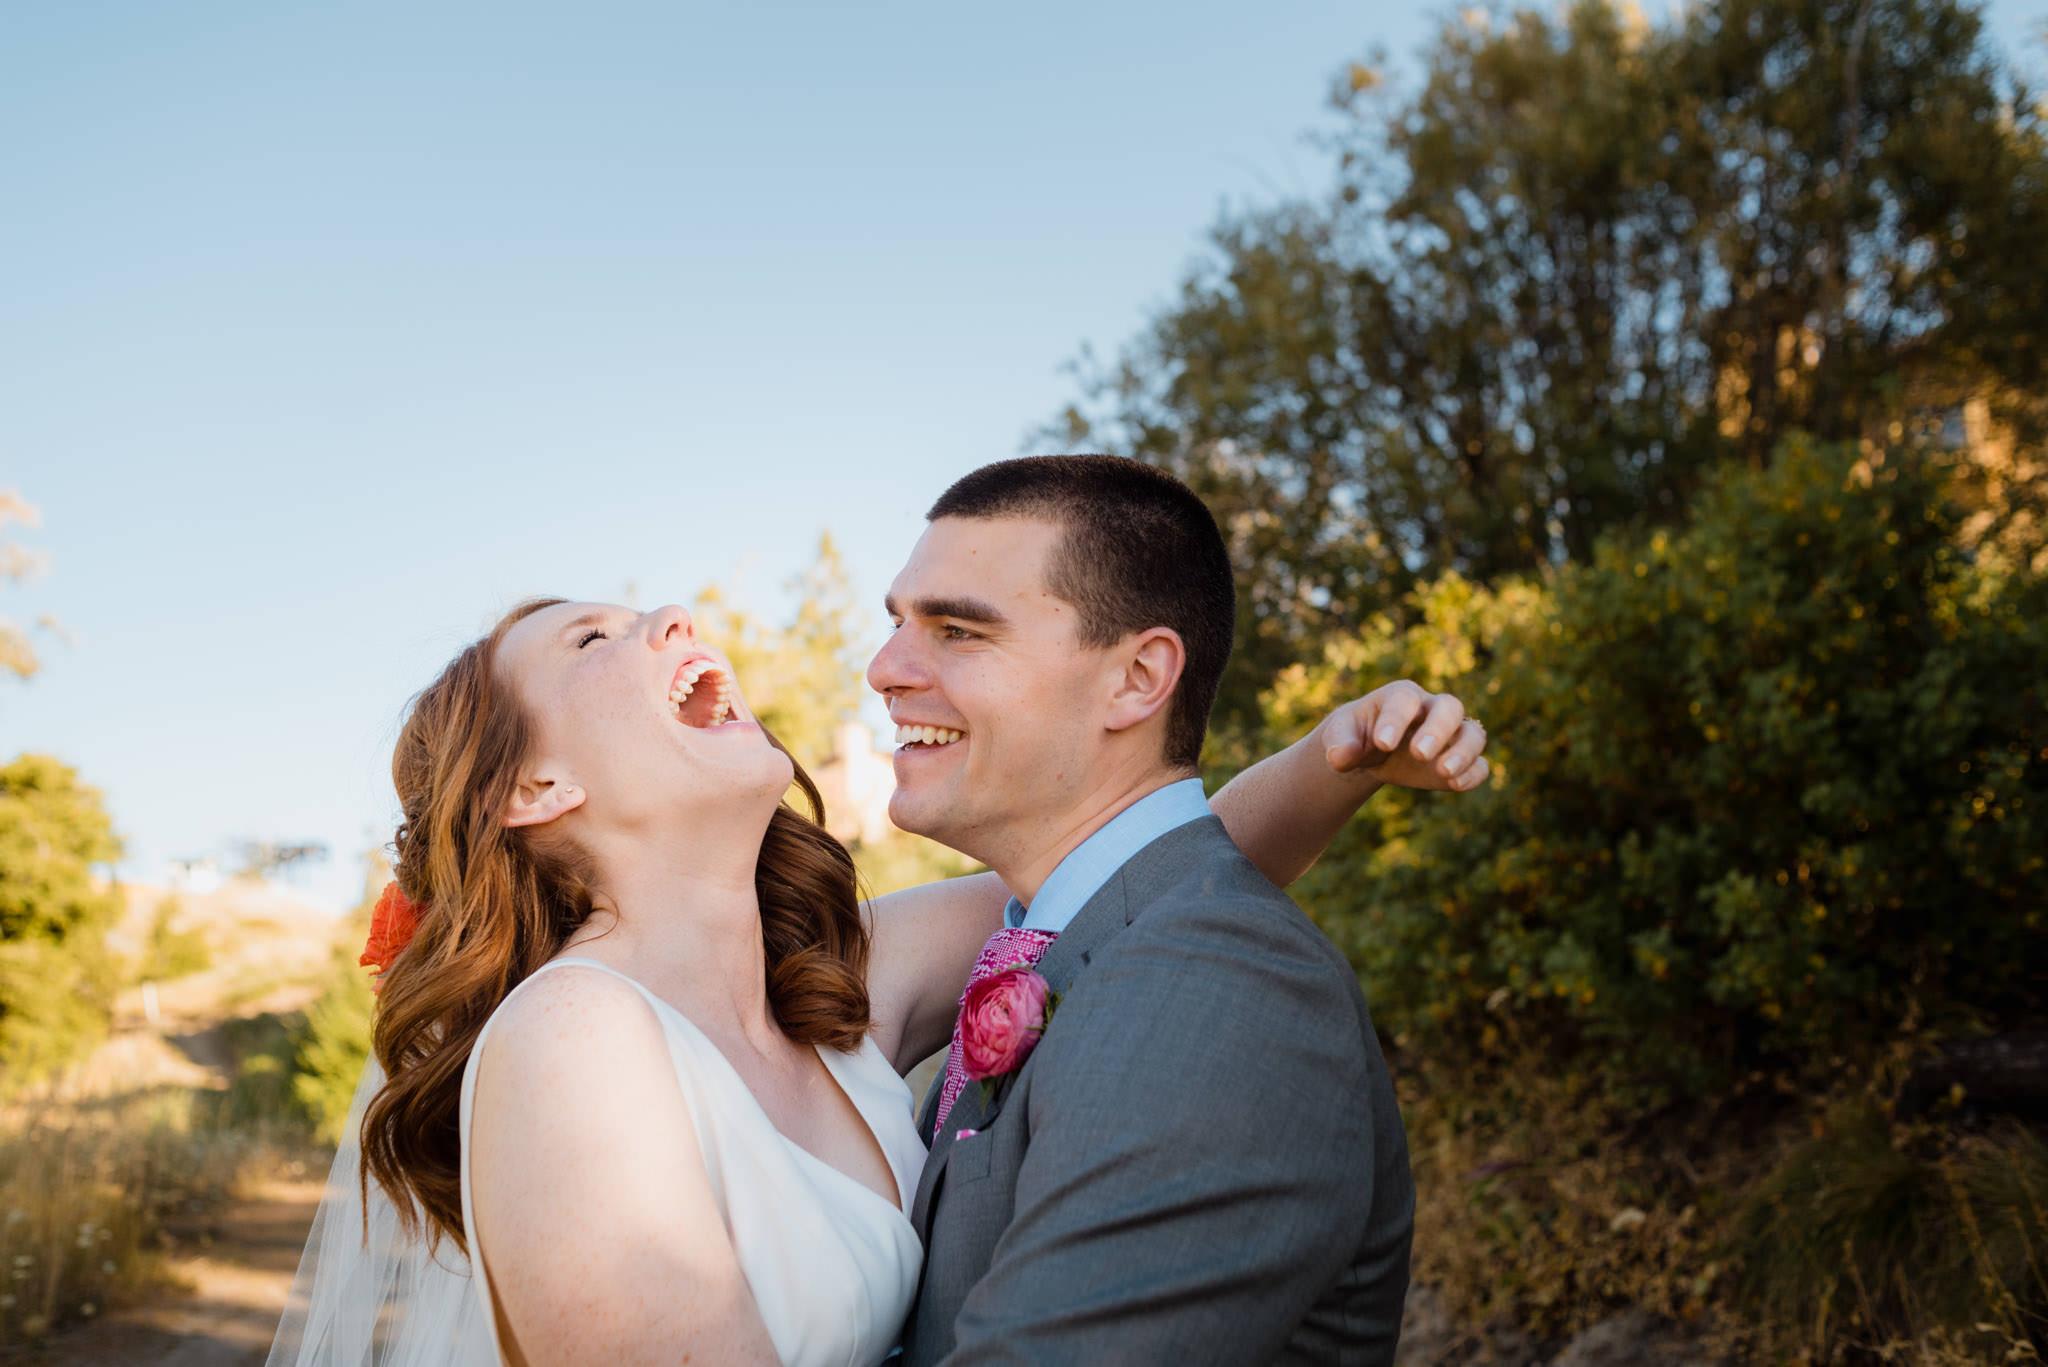 Zilla Photography - Bogus Basin Idaho Laughing Couple Portraits Outdoor Summer DIY Wedding-13.jpg